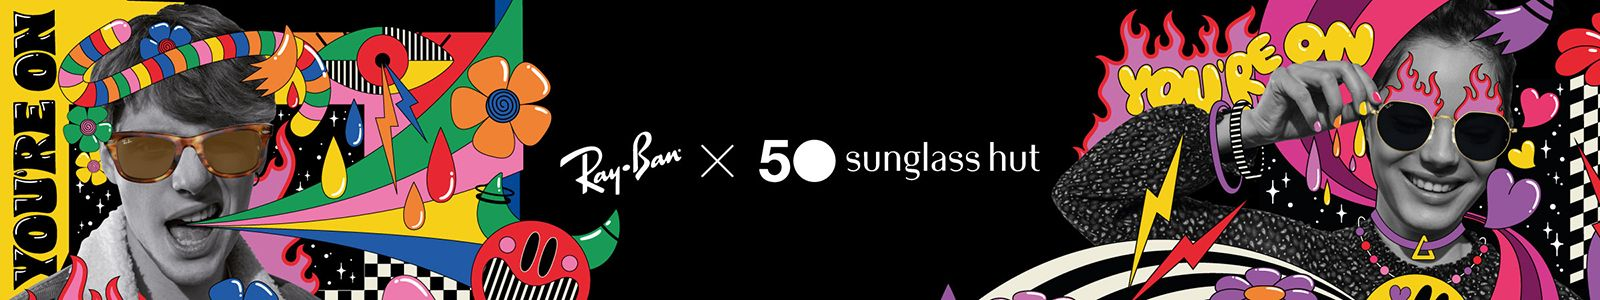 You're On, Ray-ban X 50 sunglass hut